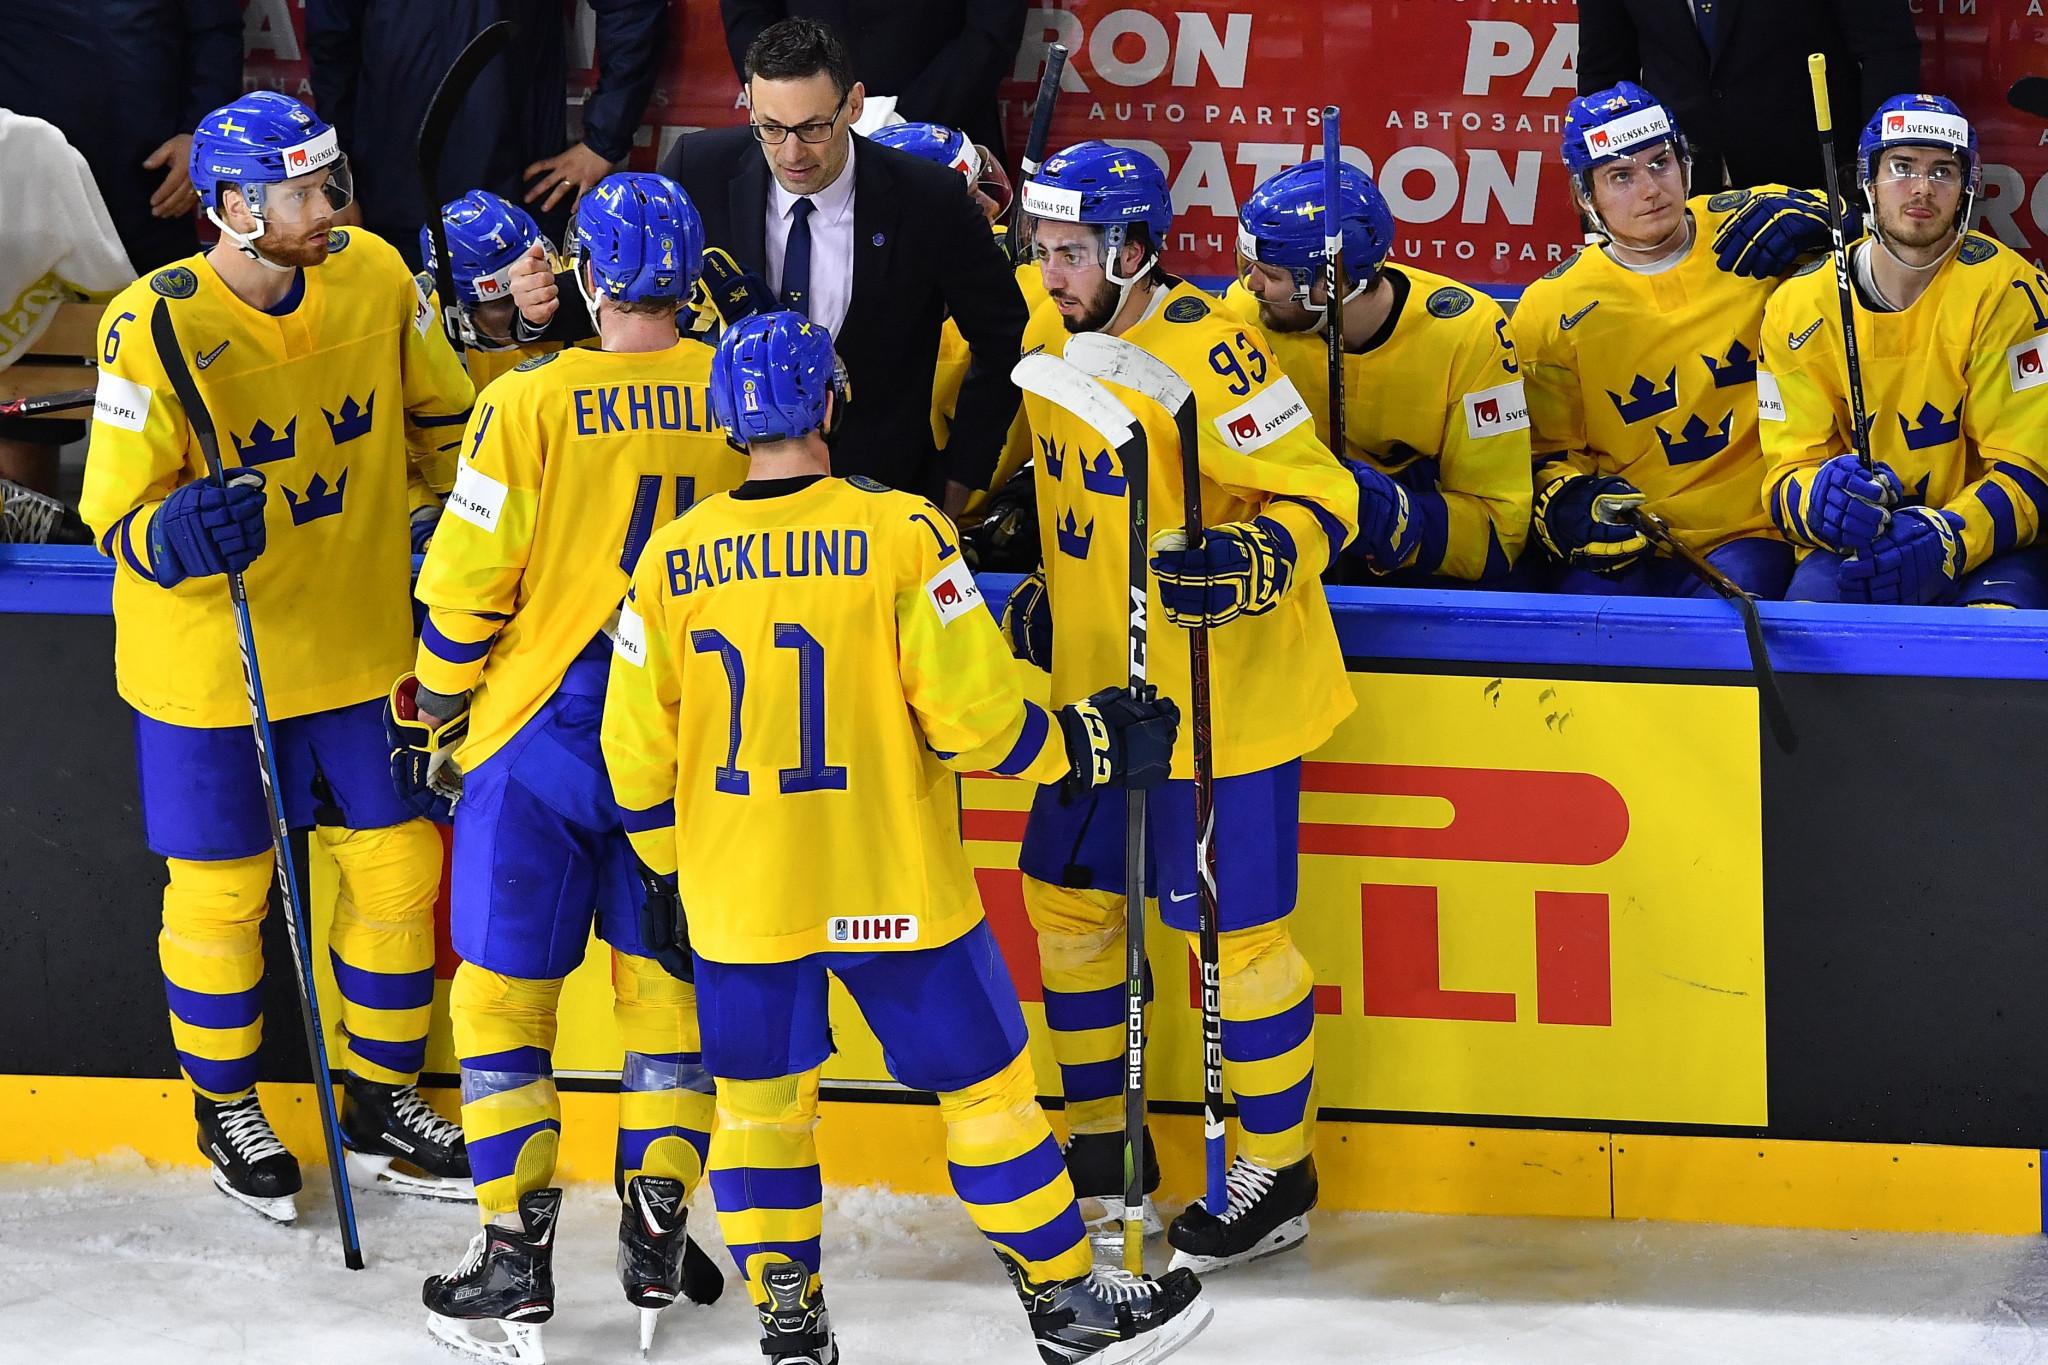 Grönborg to depart as Swedish ice hockey coach after 2019 World Championship